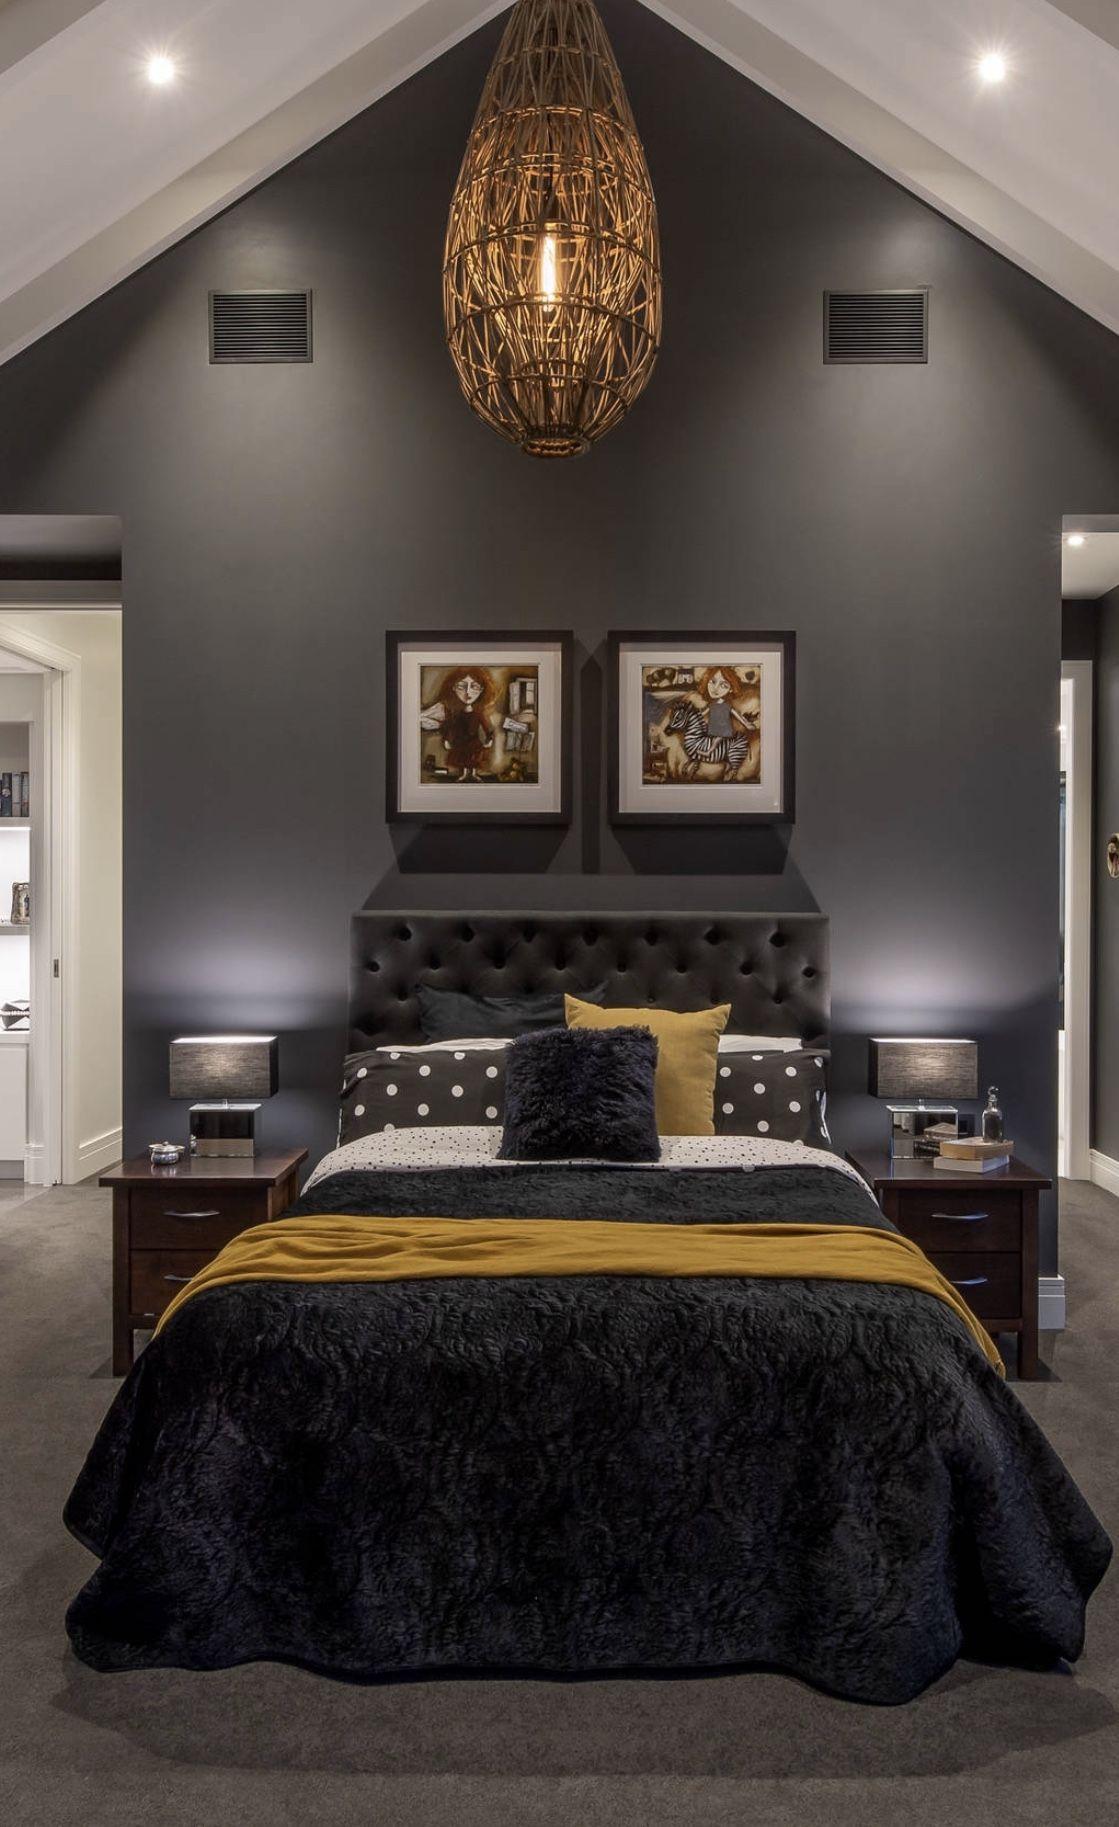 Beautiful Black Bedroom Black Decor Black Bed Black Bedding Sheets